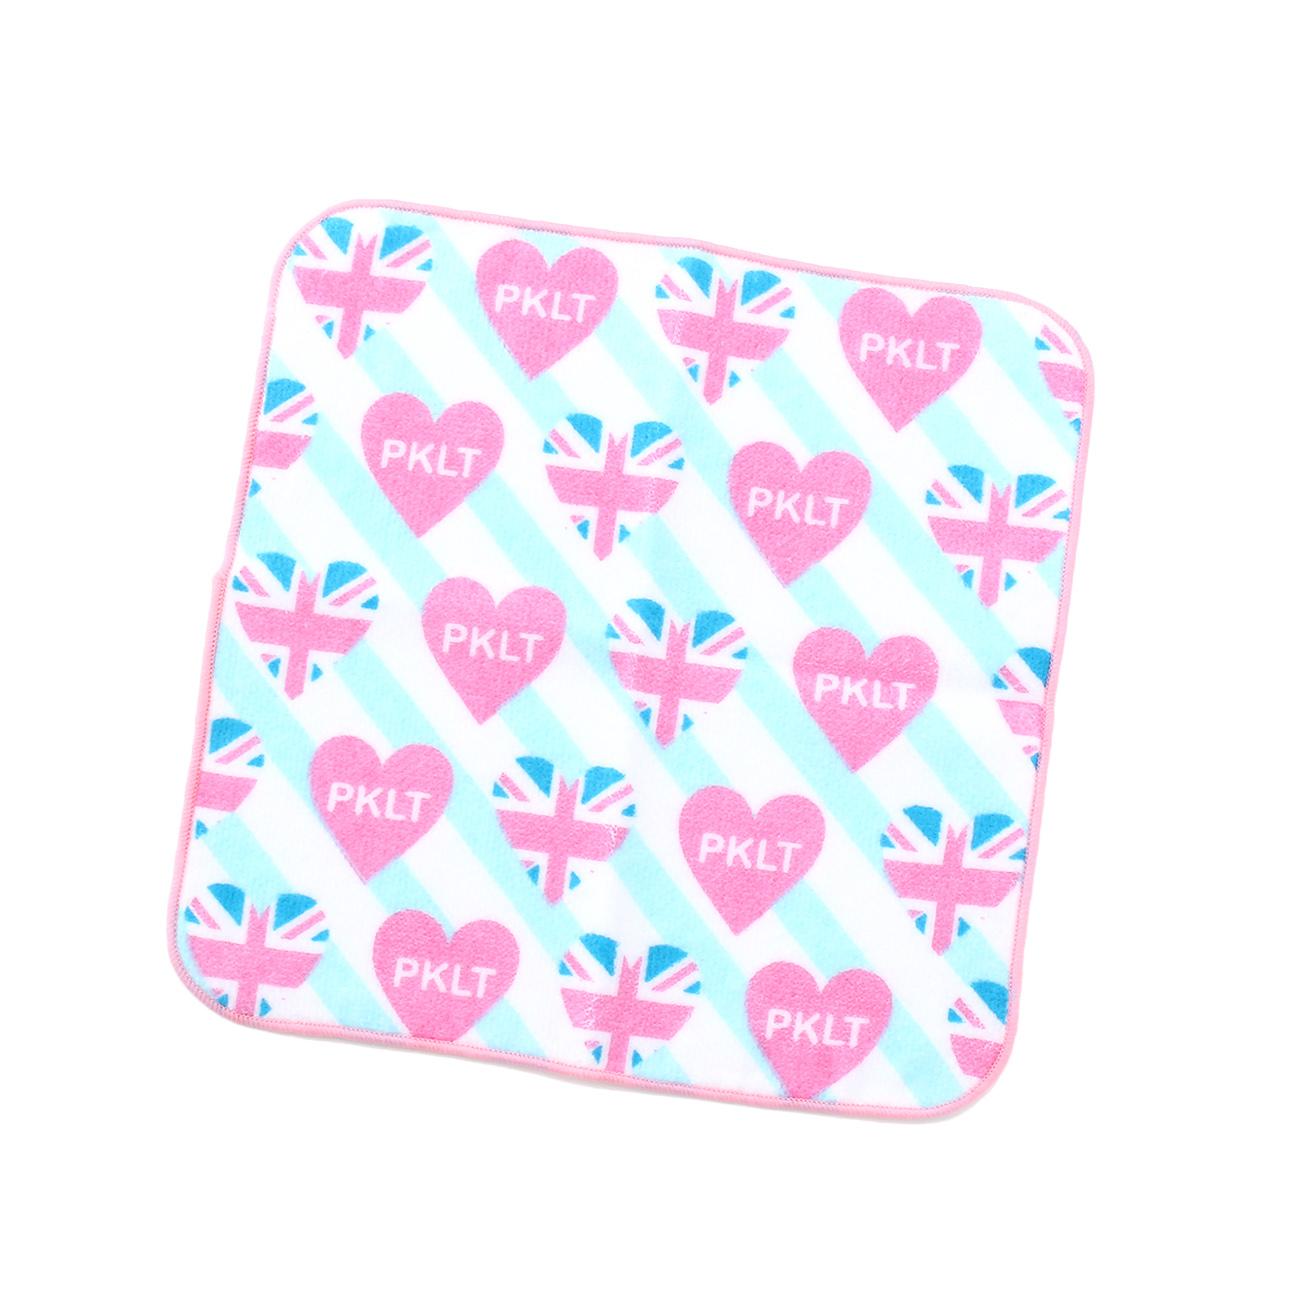 【PINK-latte (ピンク ラテ)】プリントハンドタオルティーンズ 雑貨|ハンカチ ホワイト